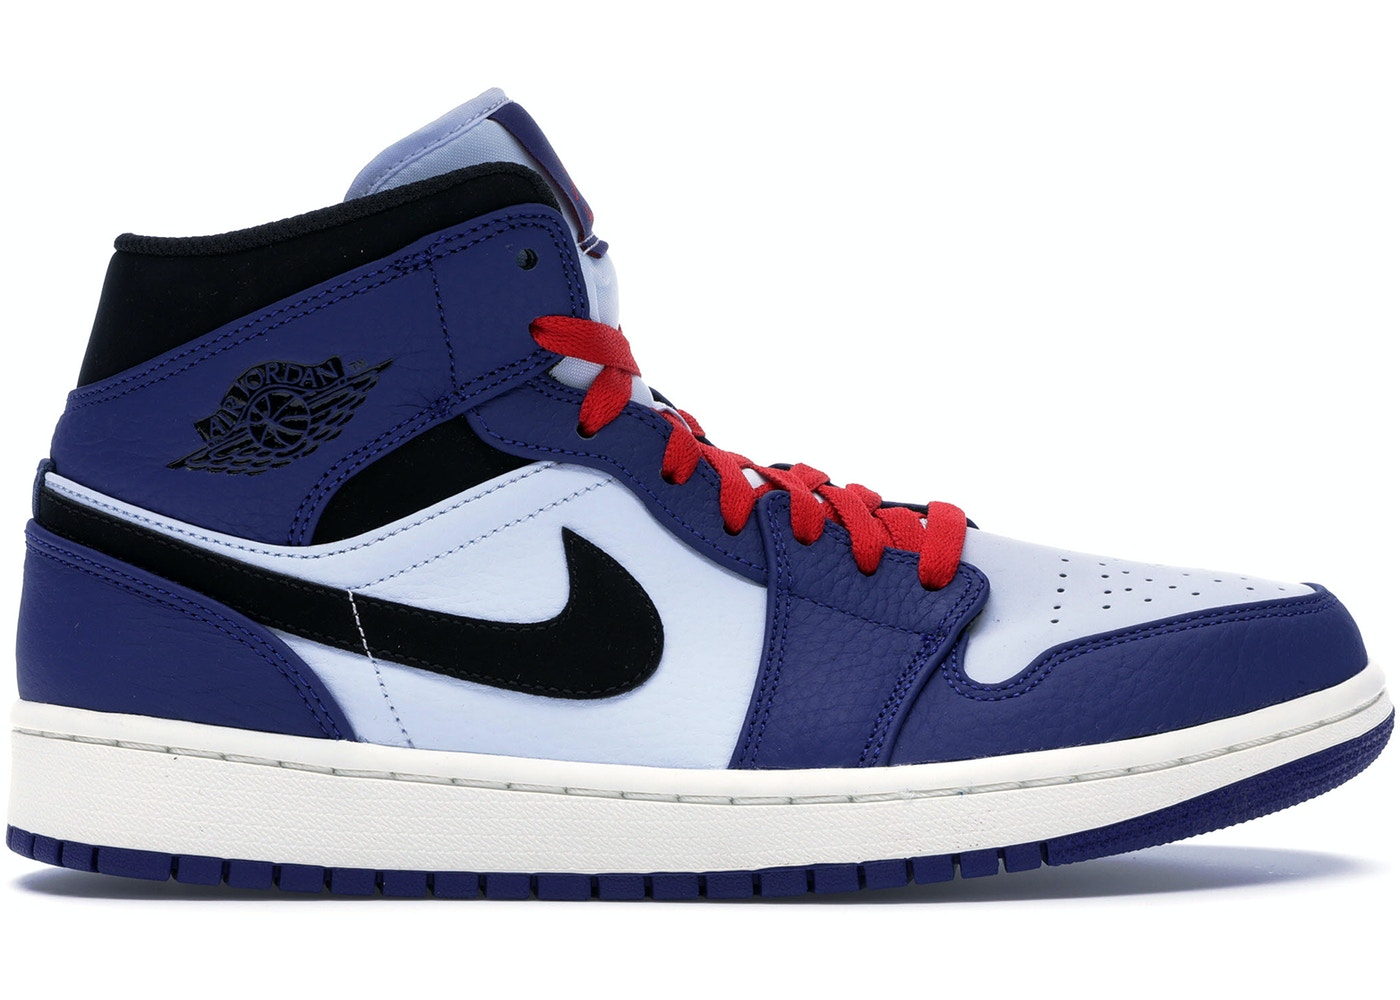 fácilmente espalda superávit  Jordan 1 Mid Deep Royal Blue Black - 852542-400